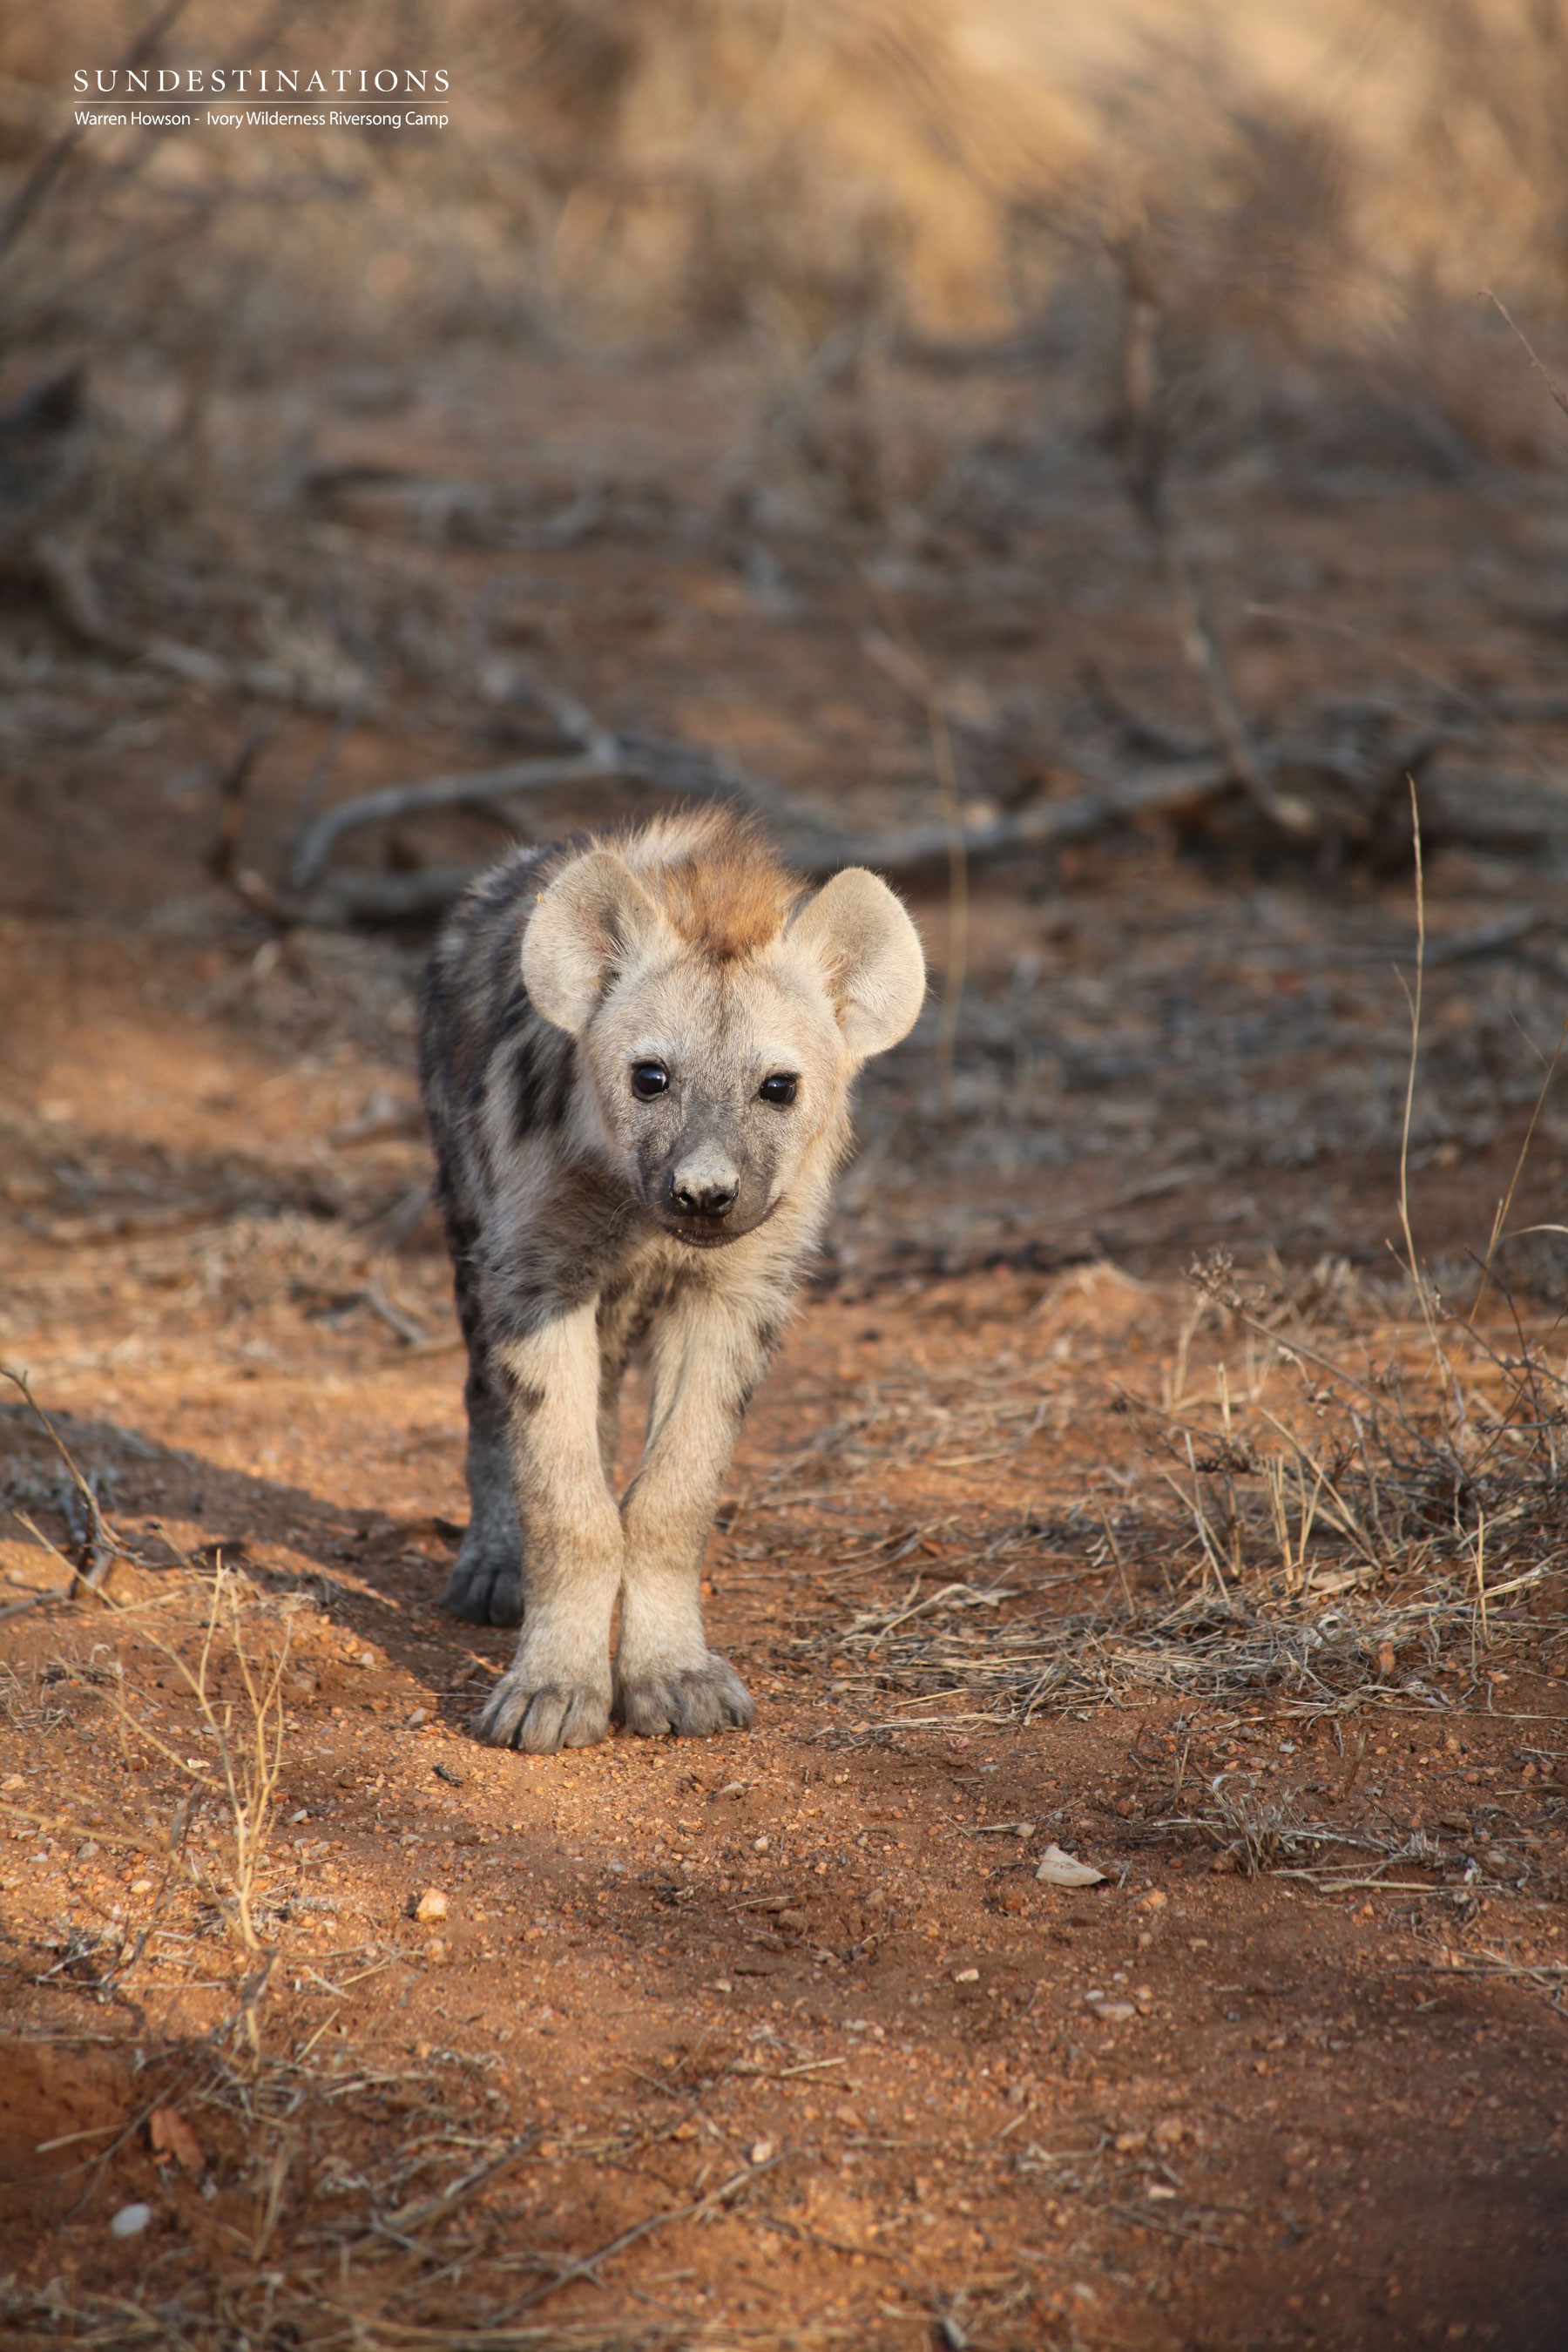 Ivory Wilderness Cub